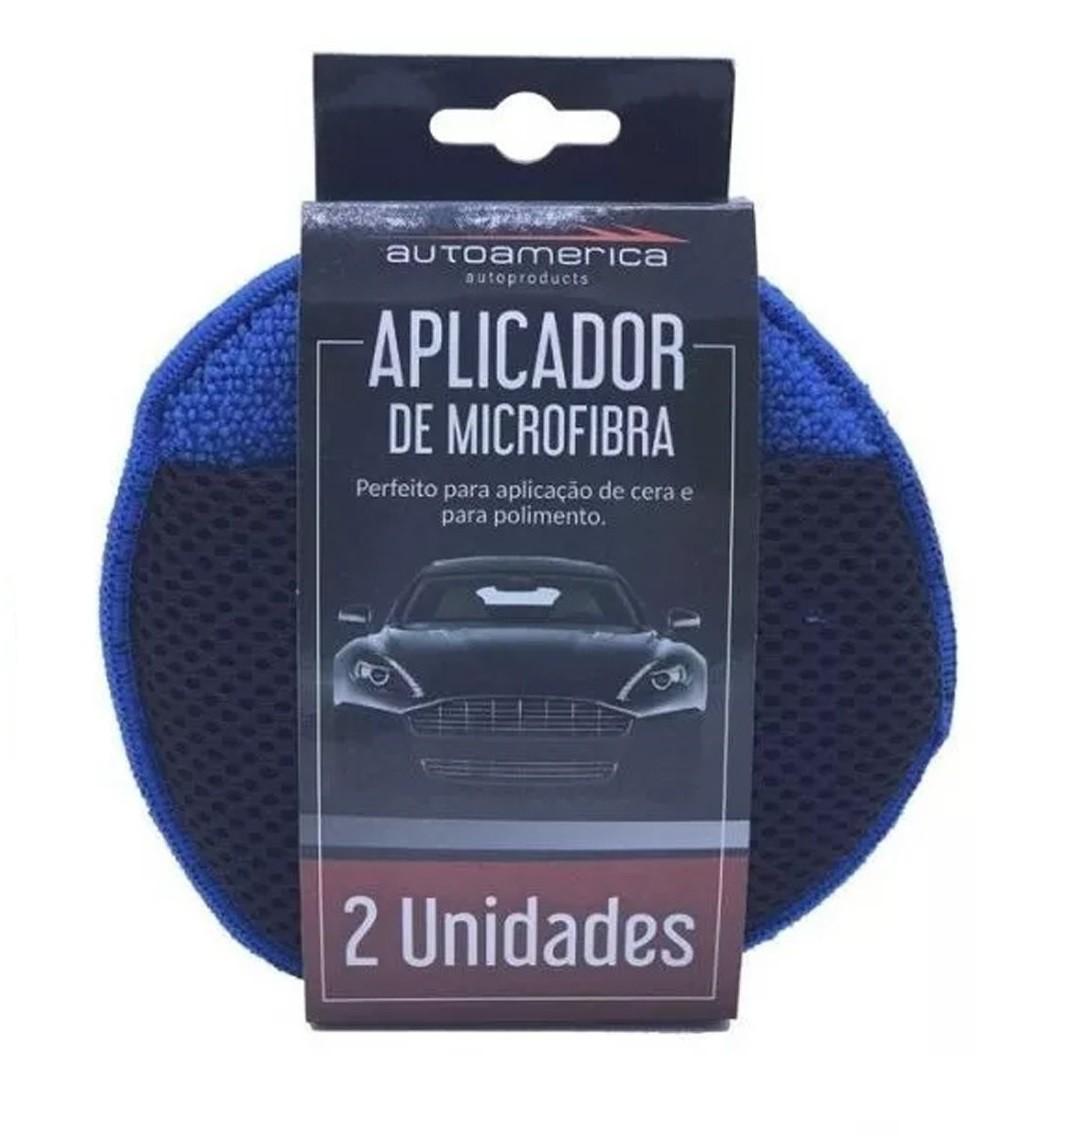 Aplicador De Microfibra Autoamerica - 2 unidades